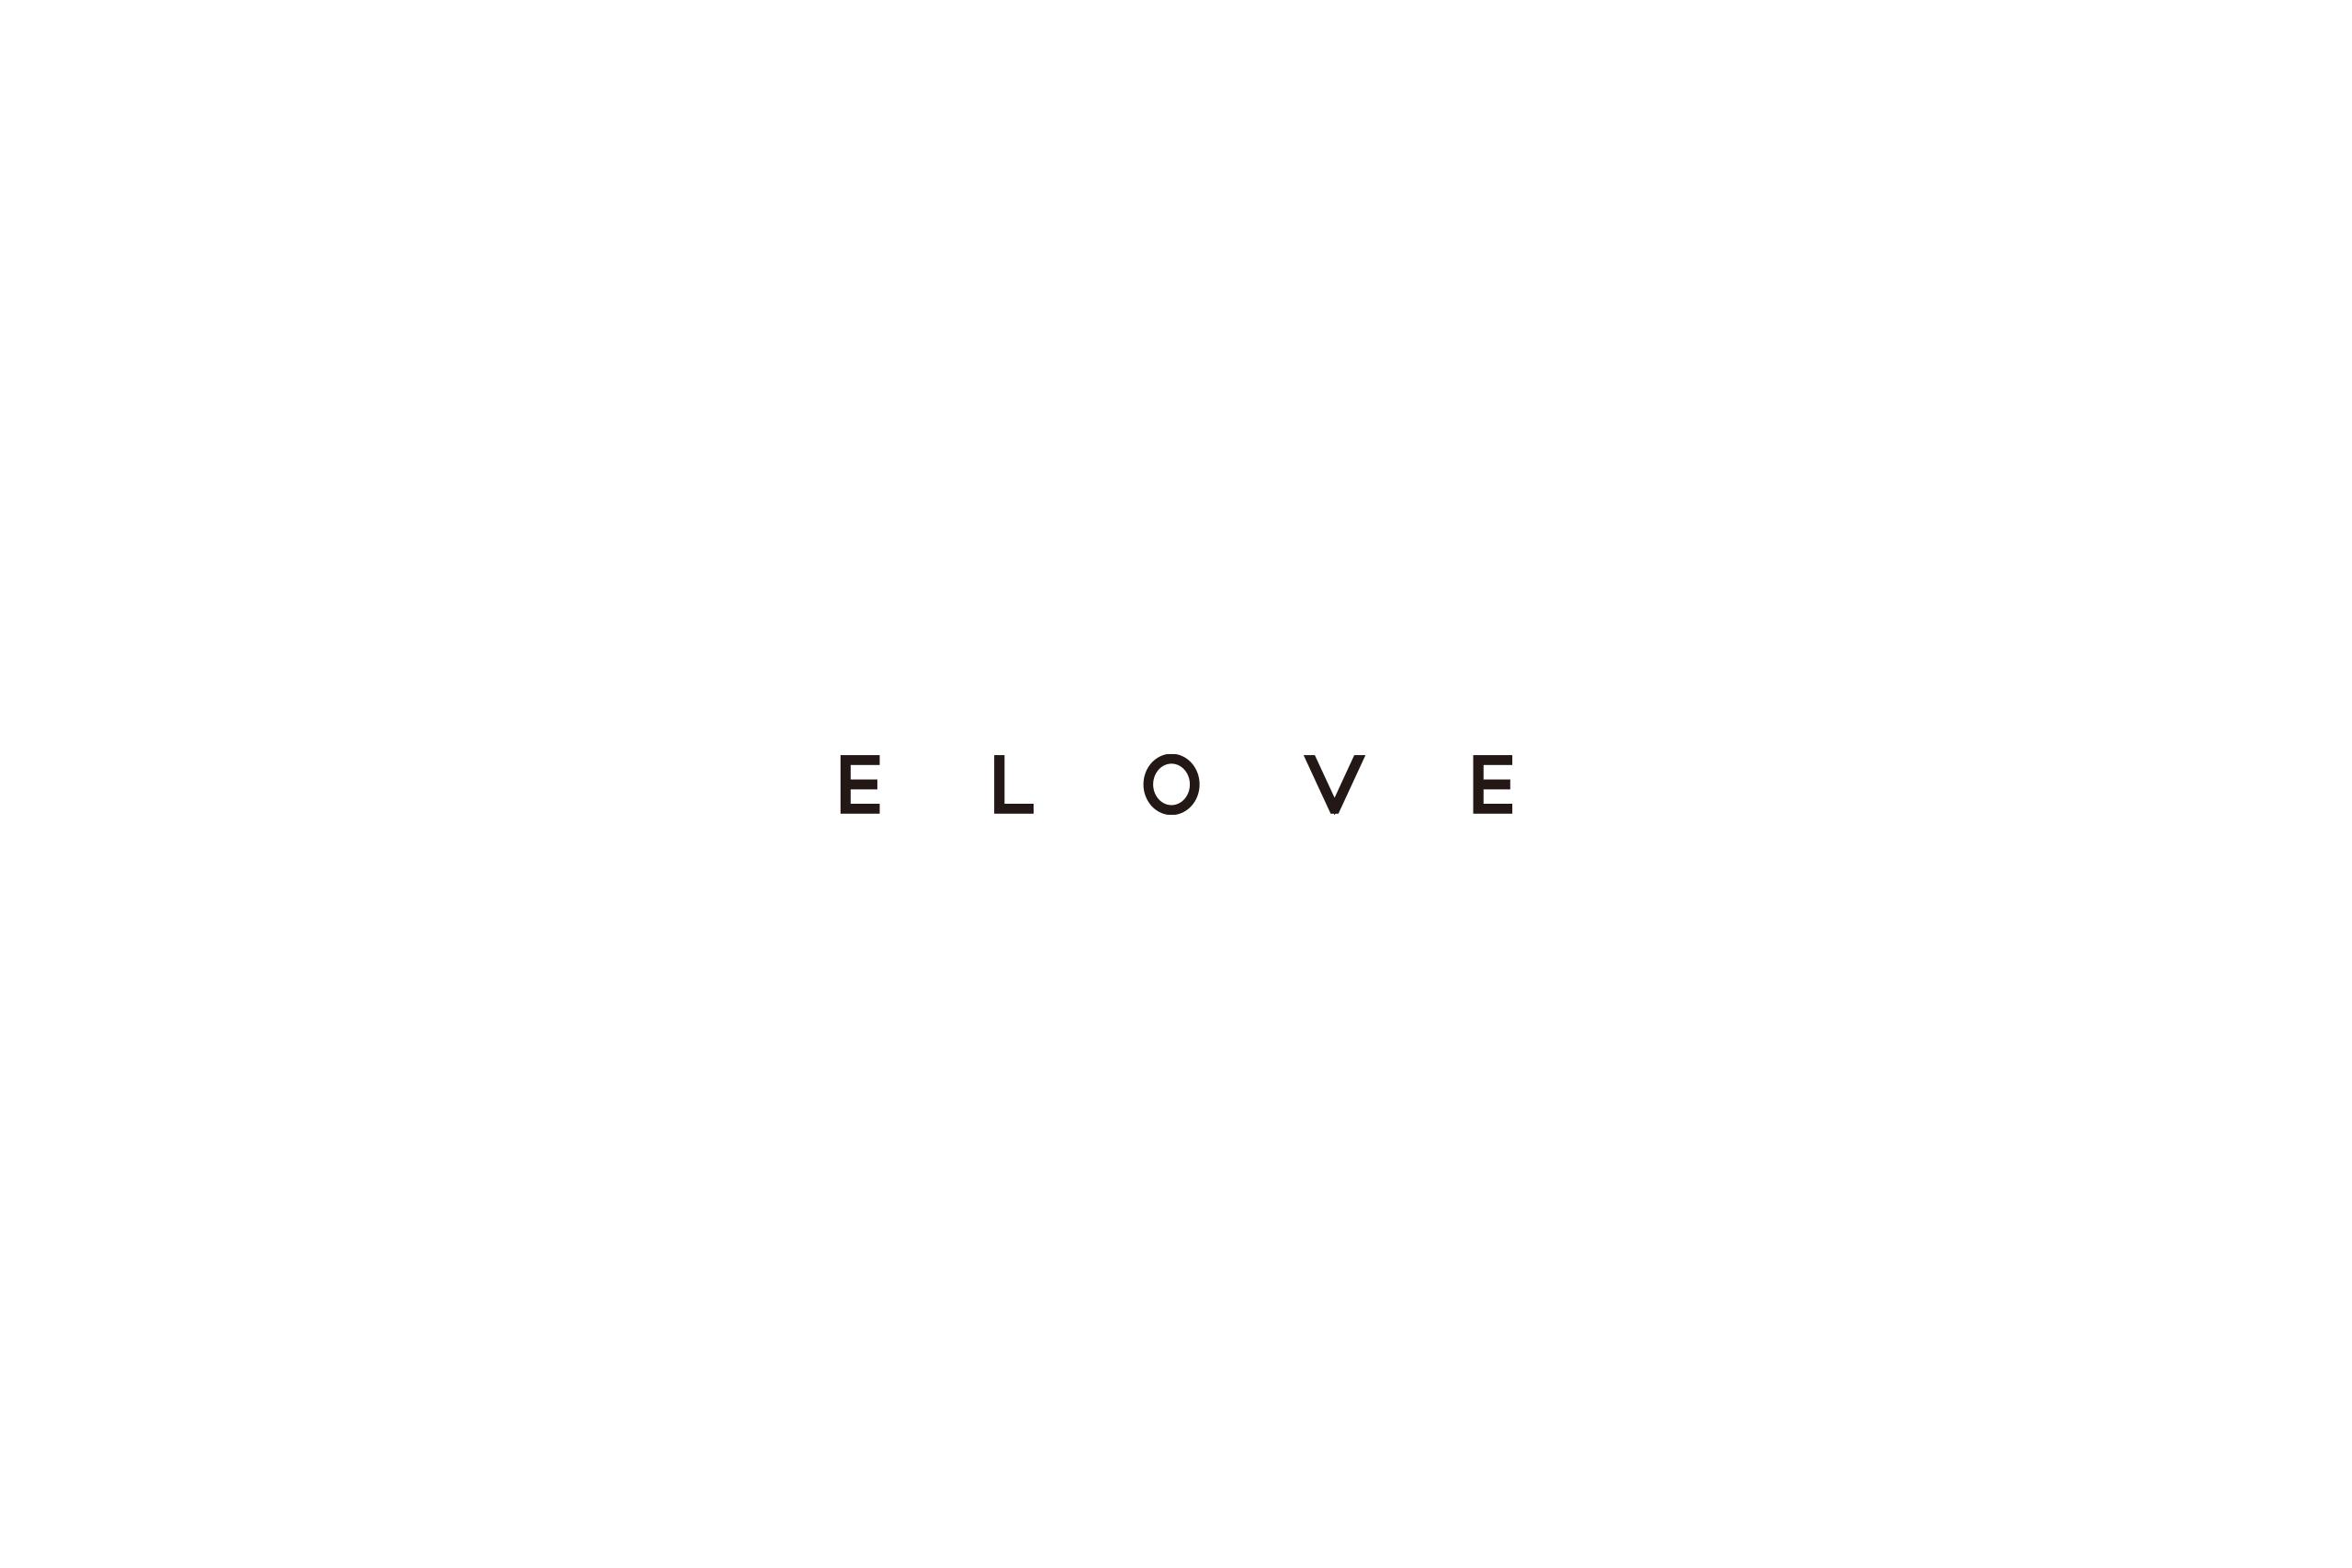 elove_logo001